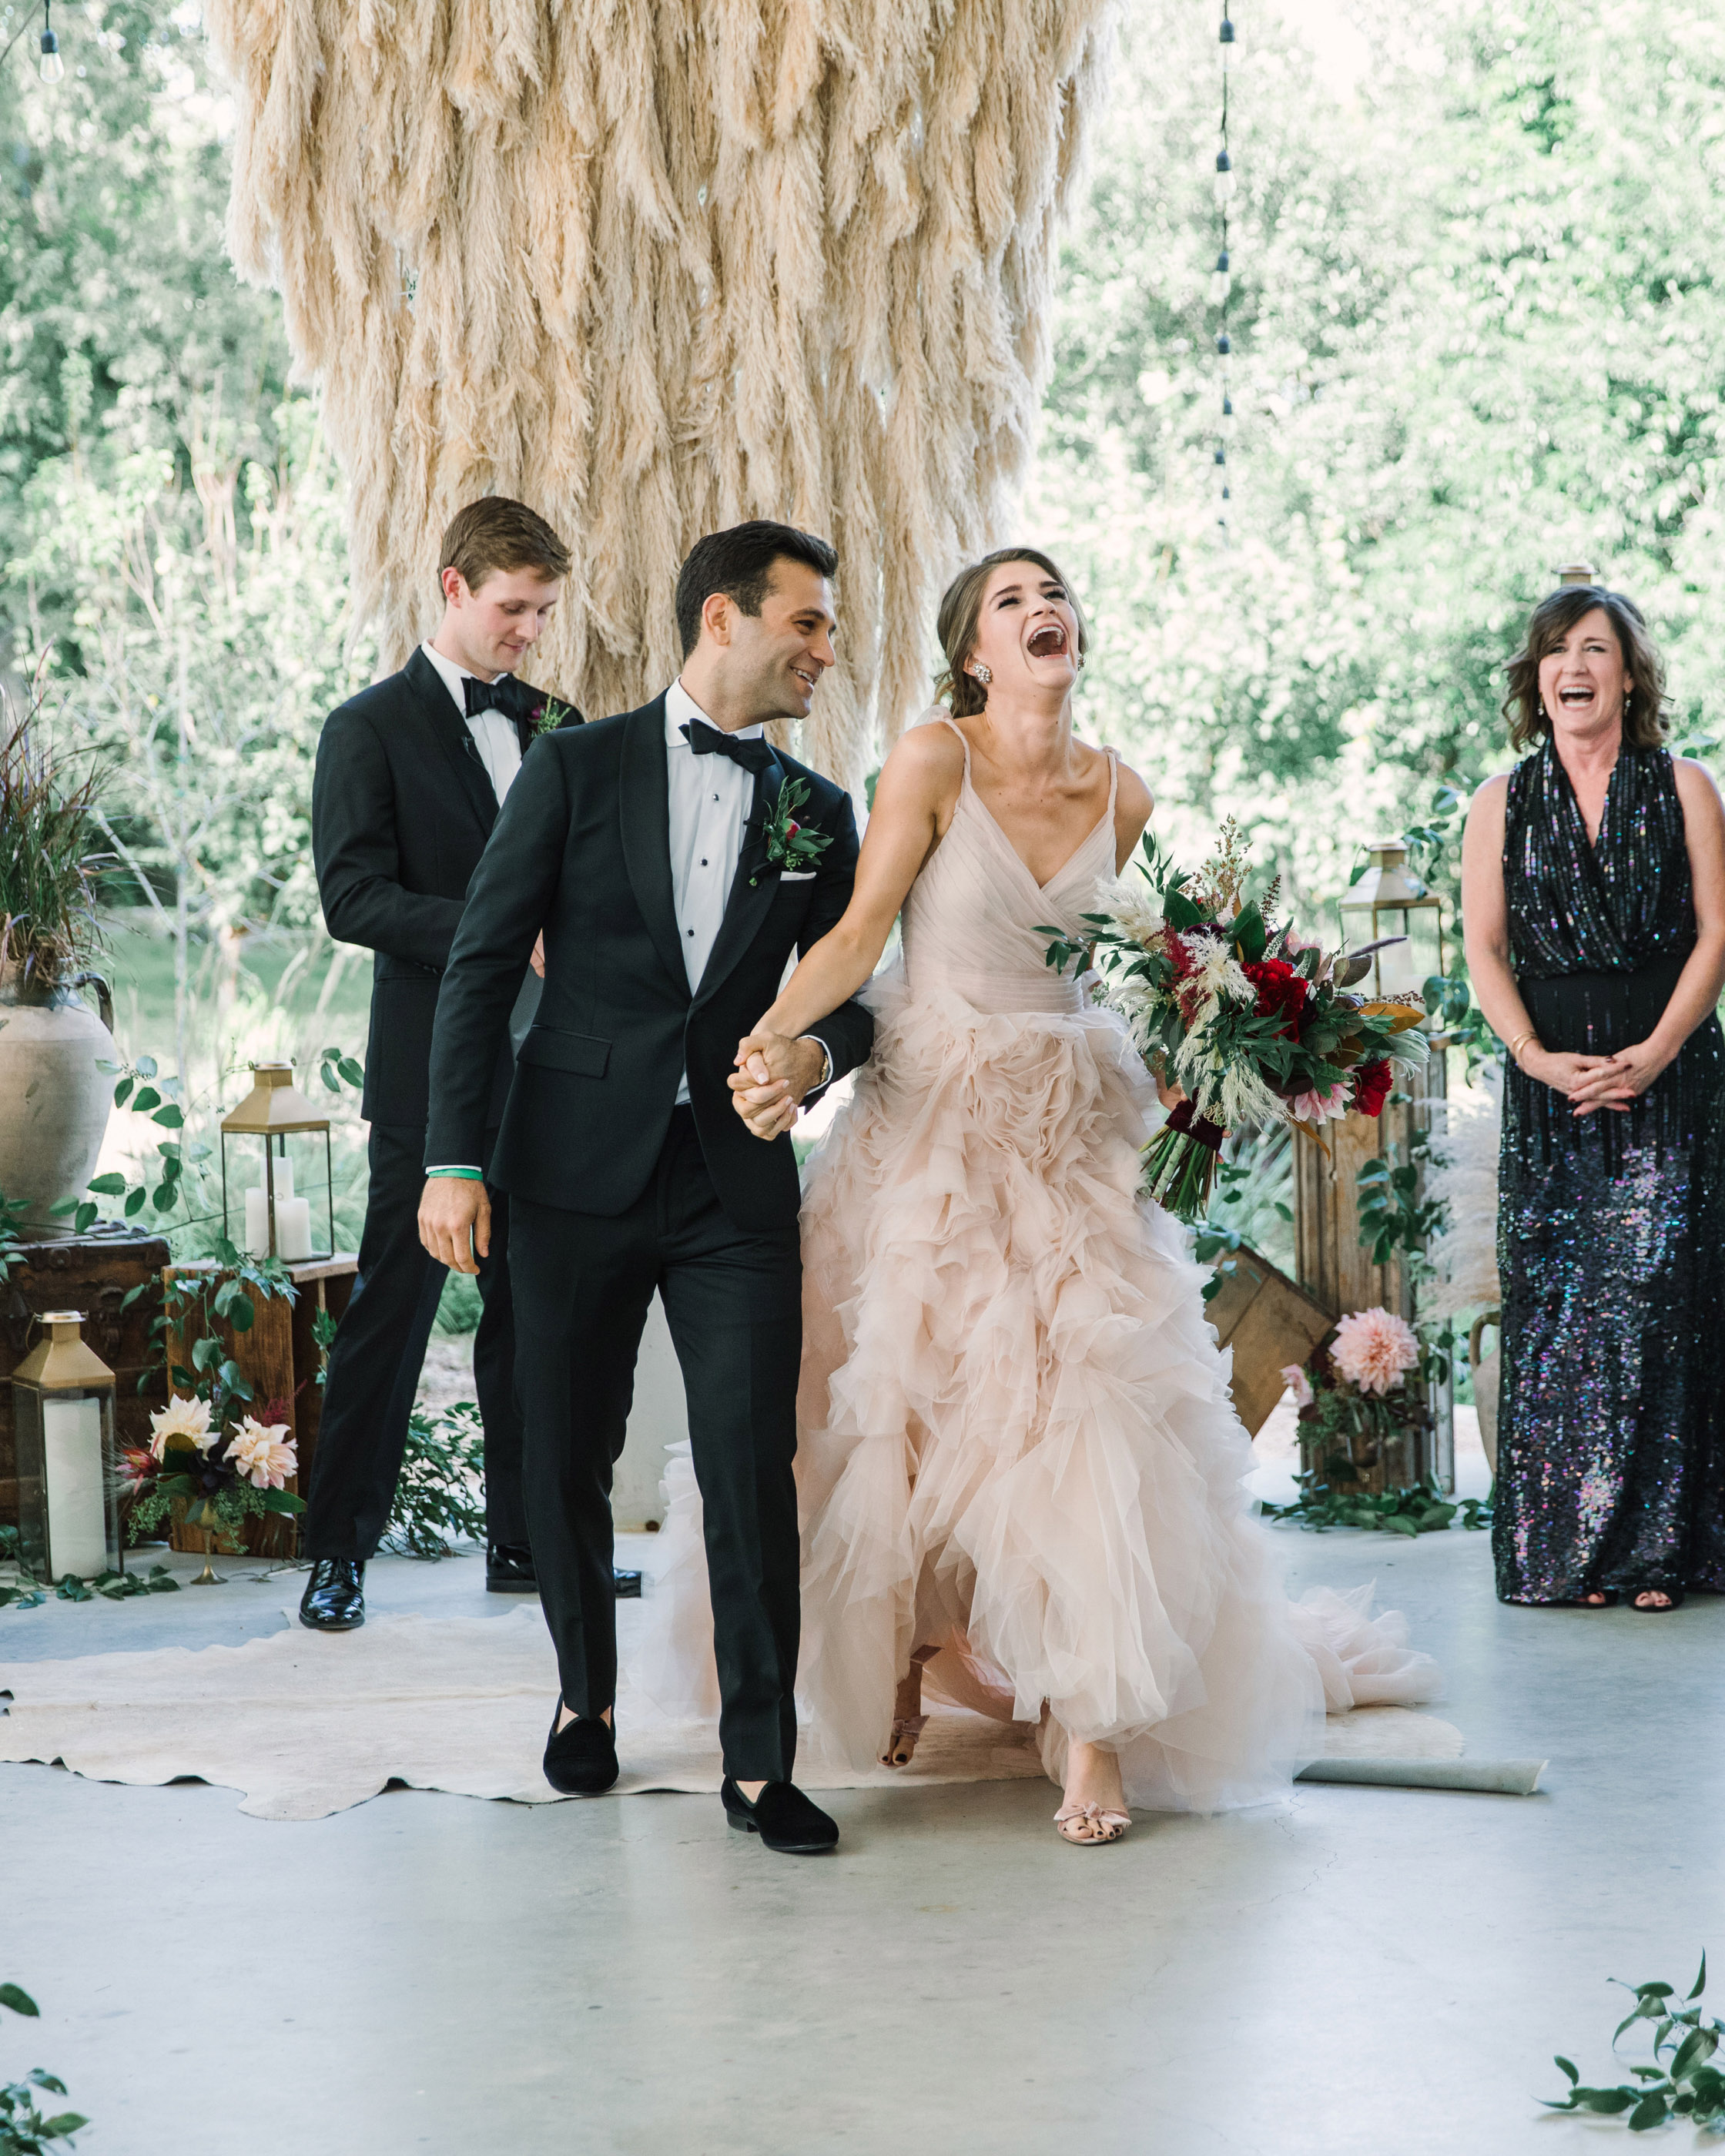 wedding ceremony bride laughter